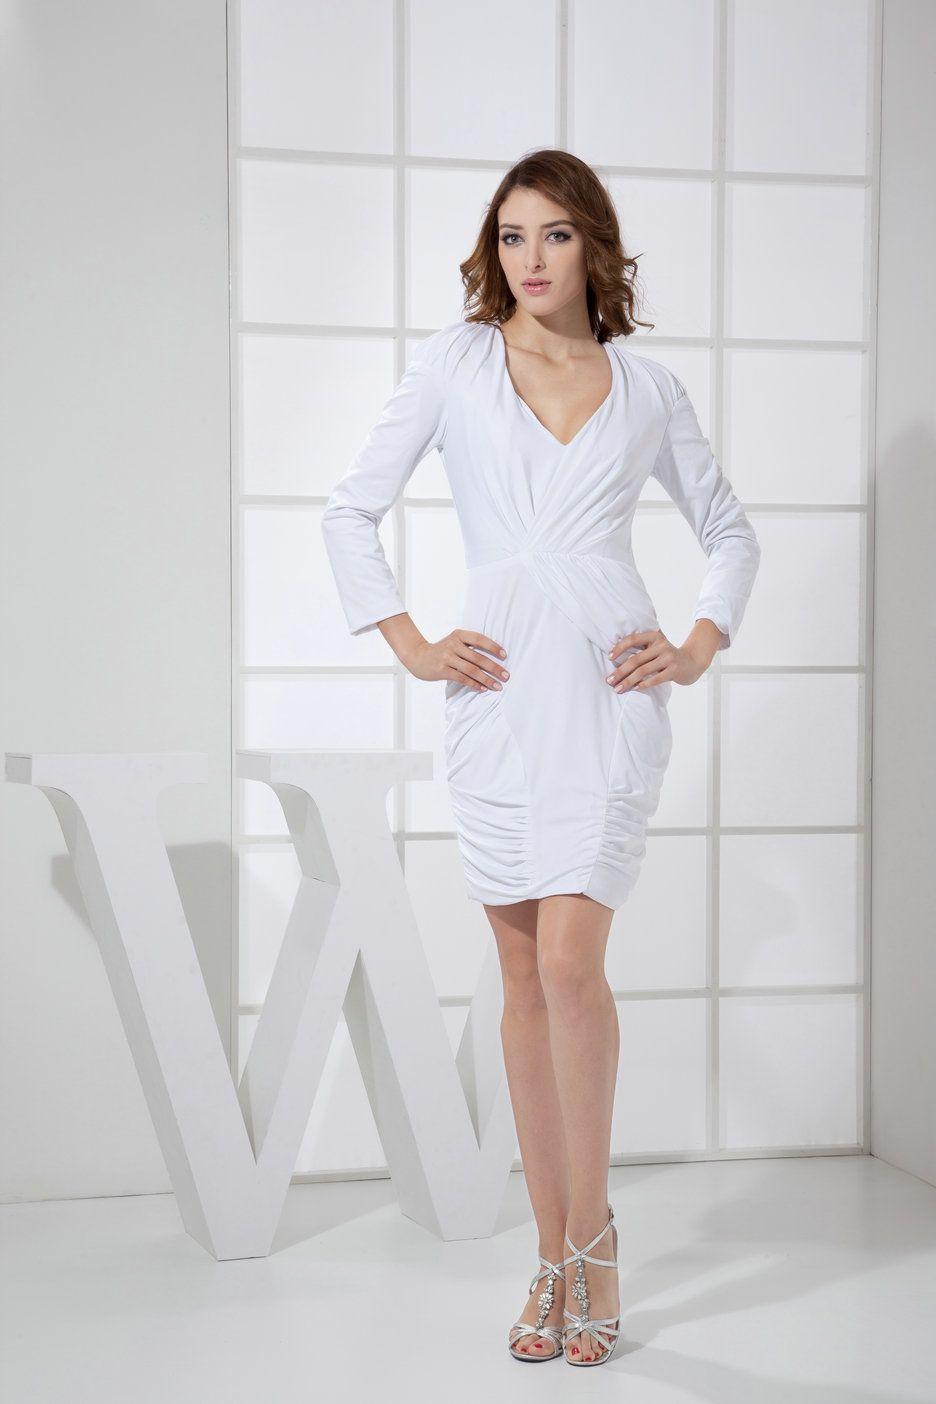 cd1eecdb45c Long Sleeves V Neck Mini White Graduation Dresses